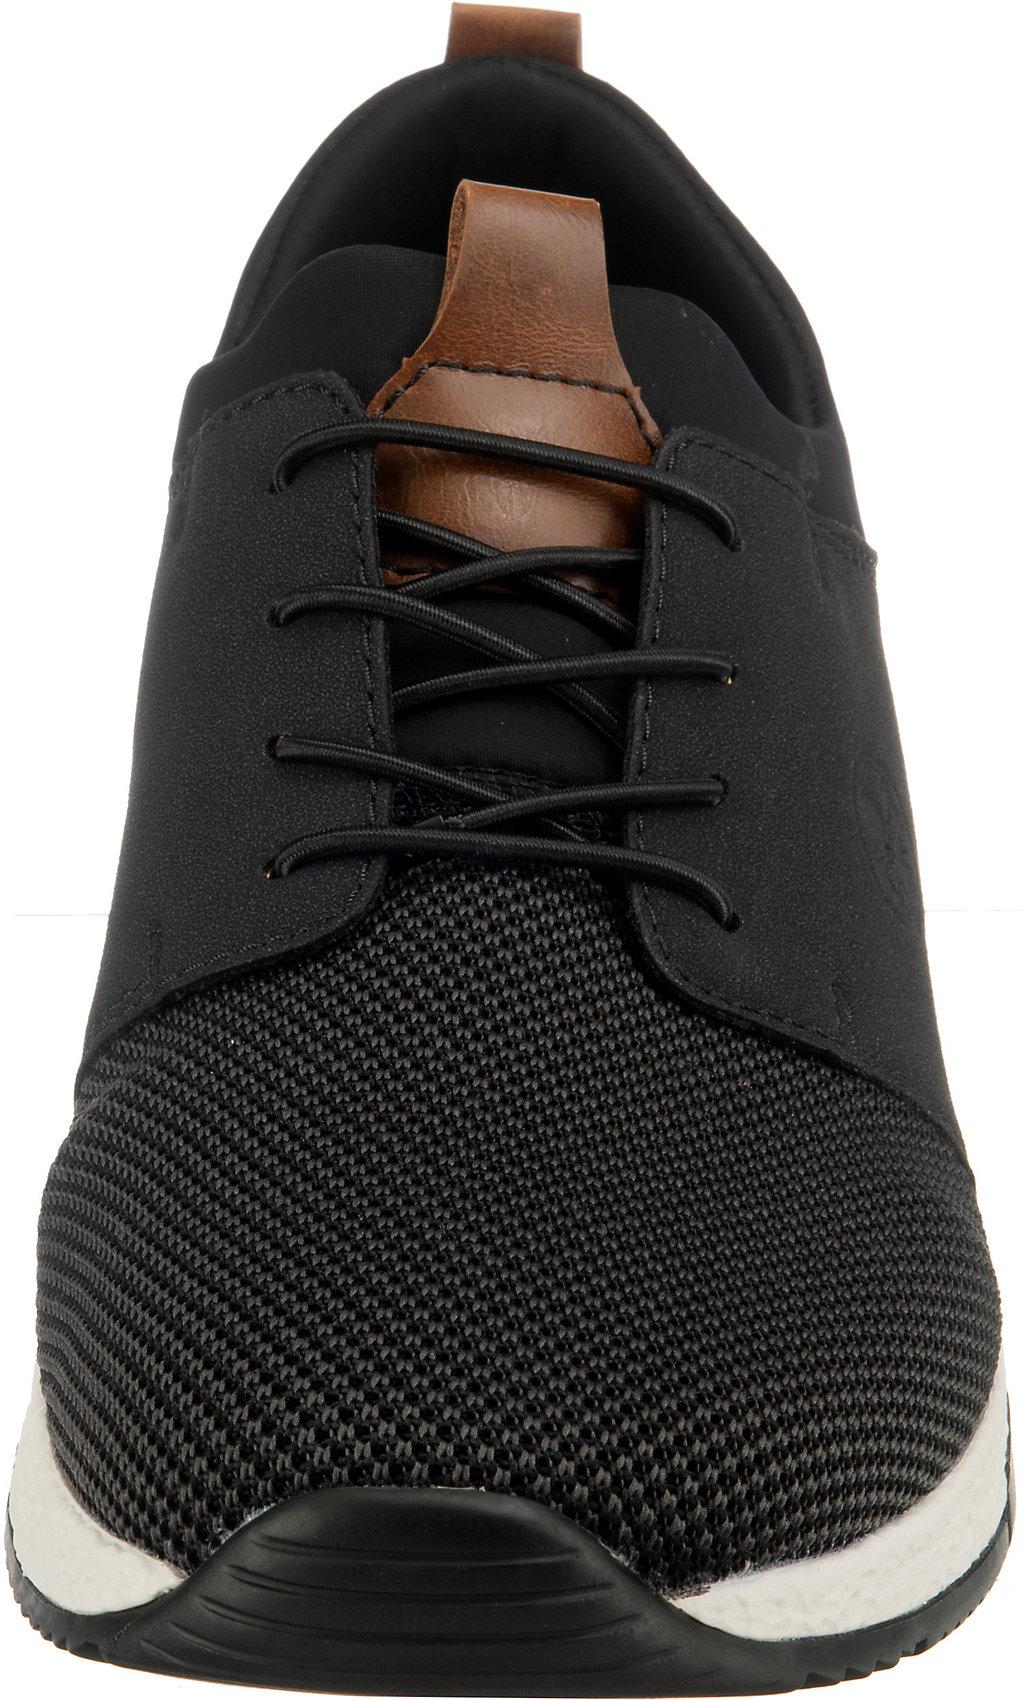 Indexbild 4 - Neu rieker Sneakers Low 12842477 für Herren schwarz